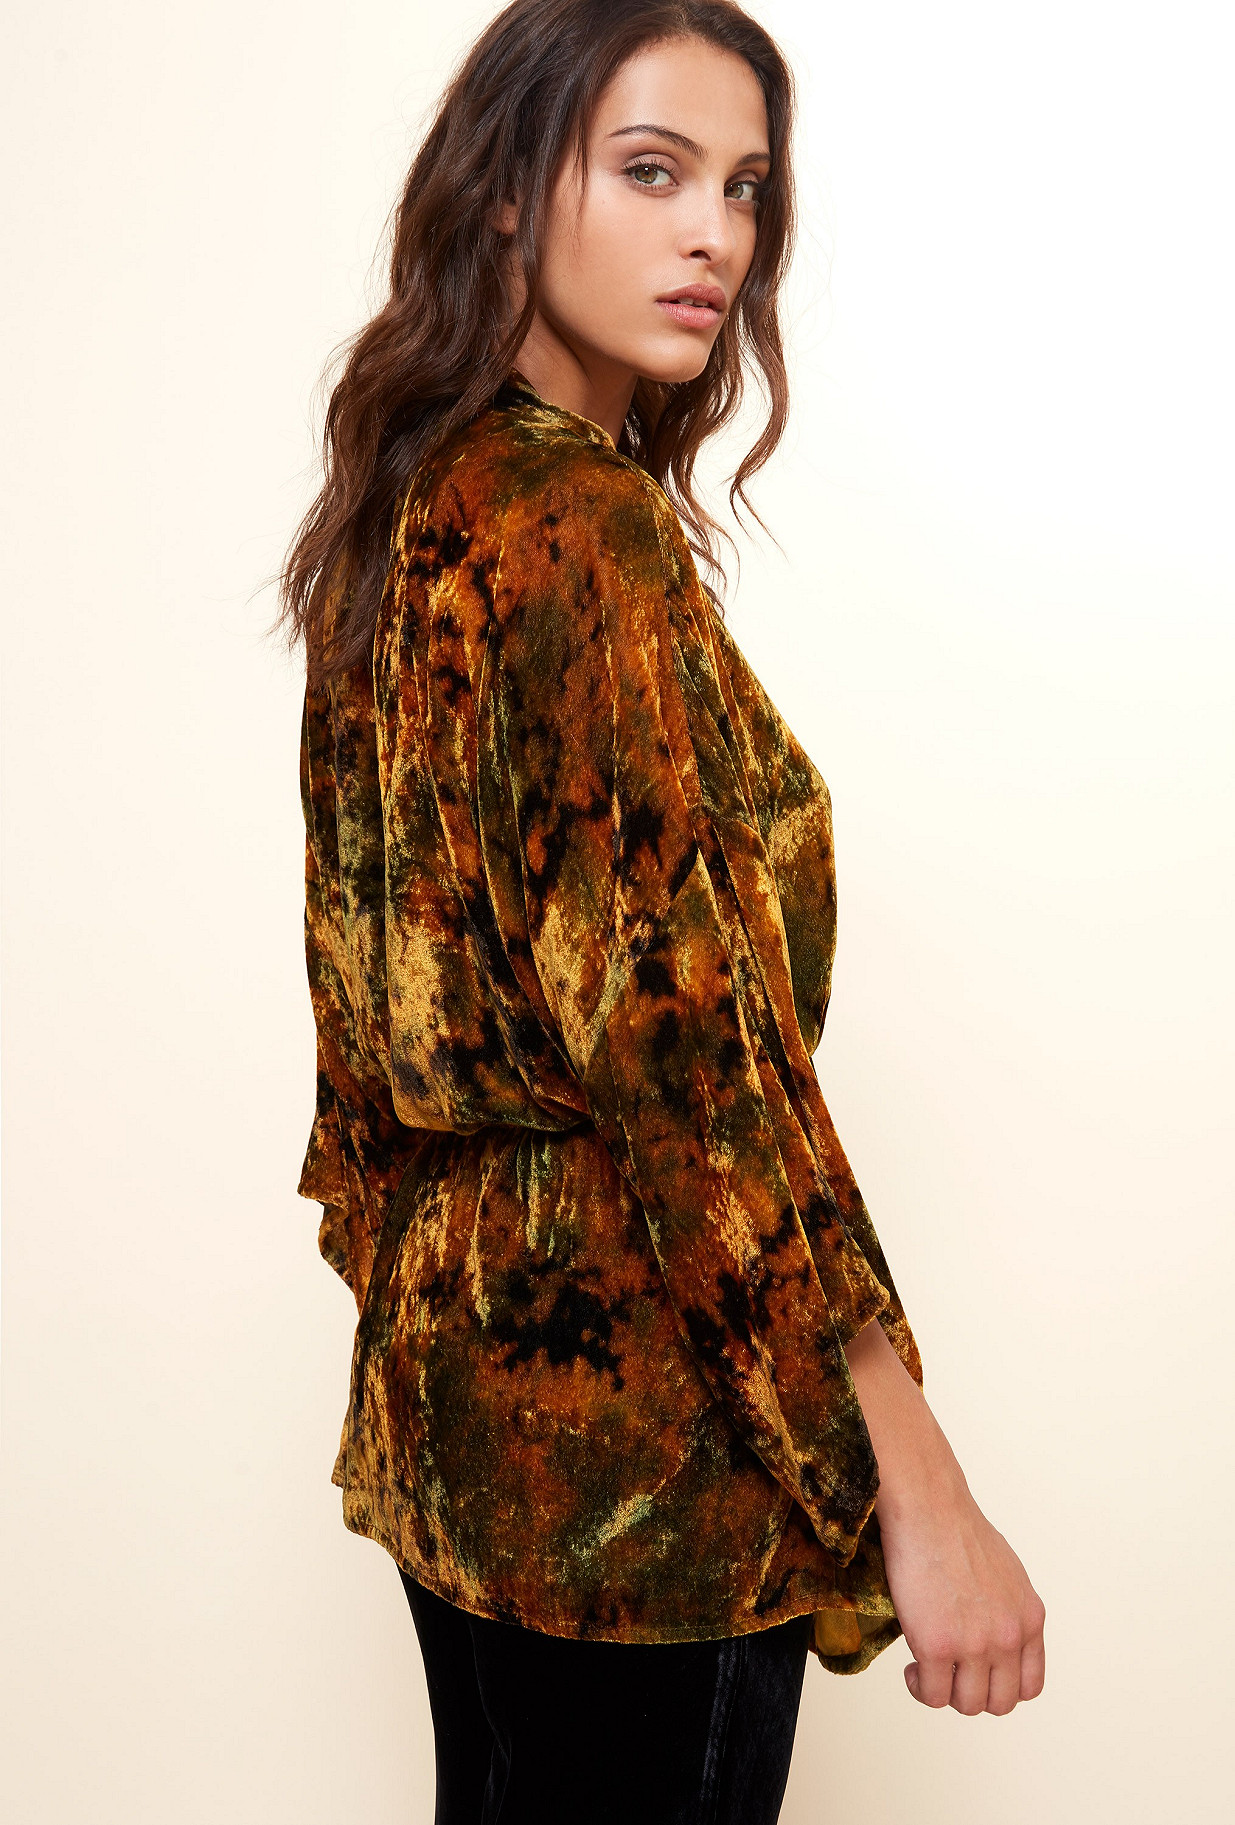 Paris clothes store KIMONO  Shana french designer fashion Paris